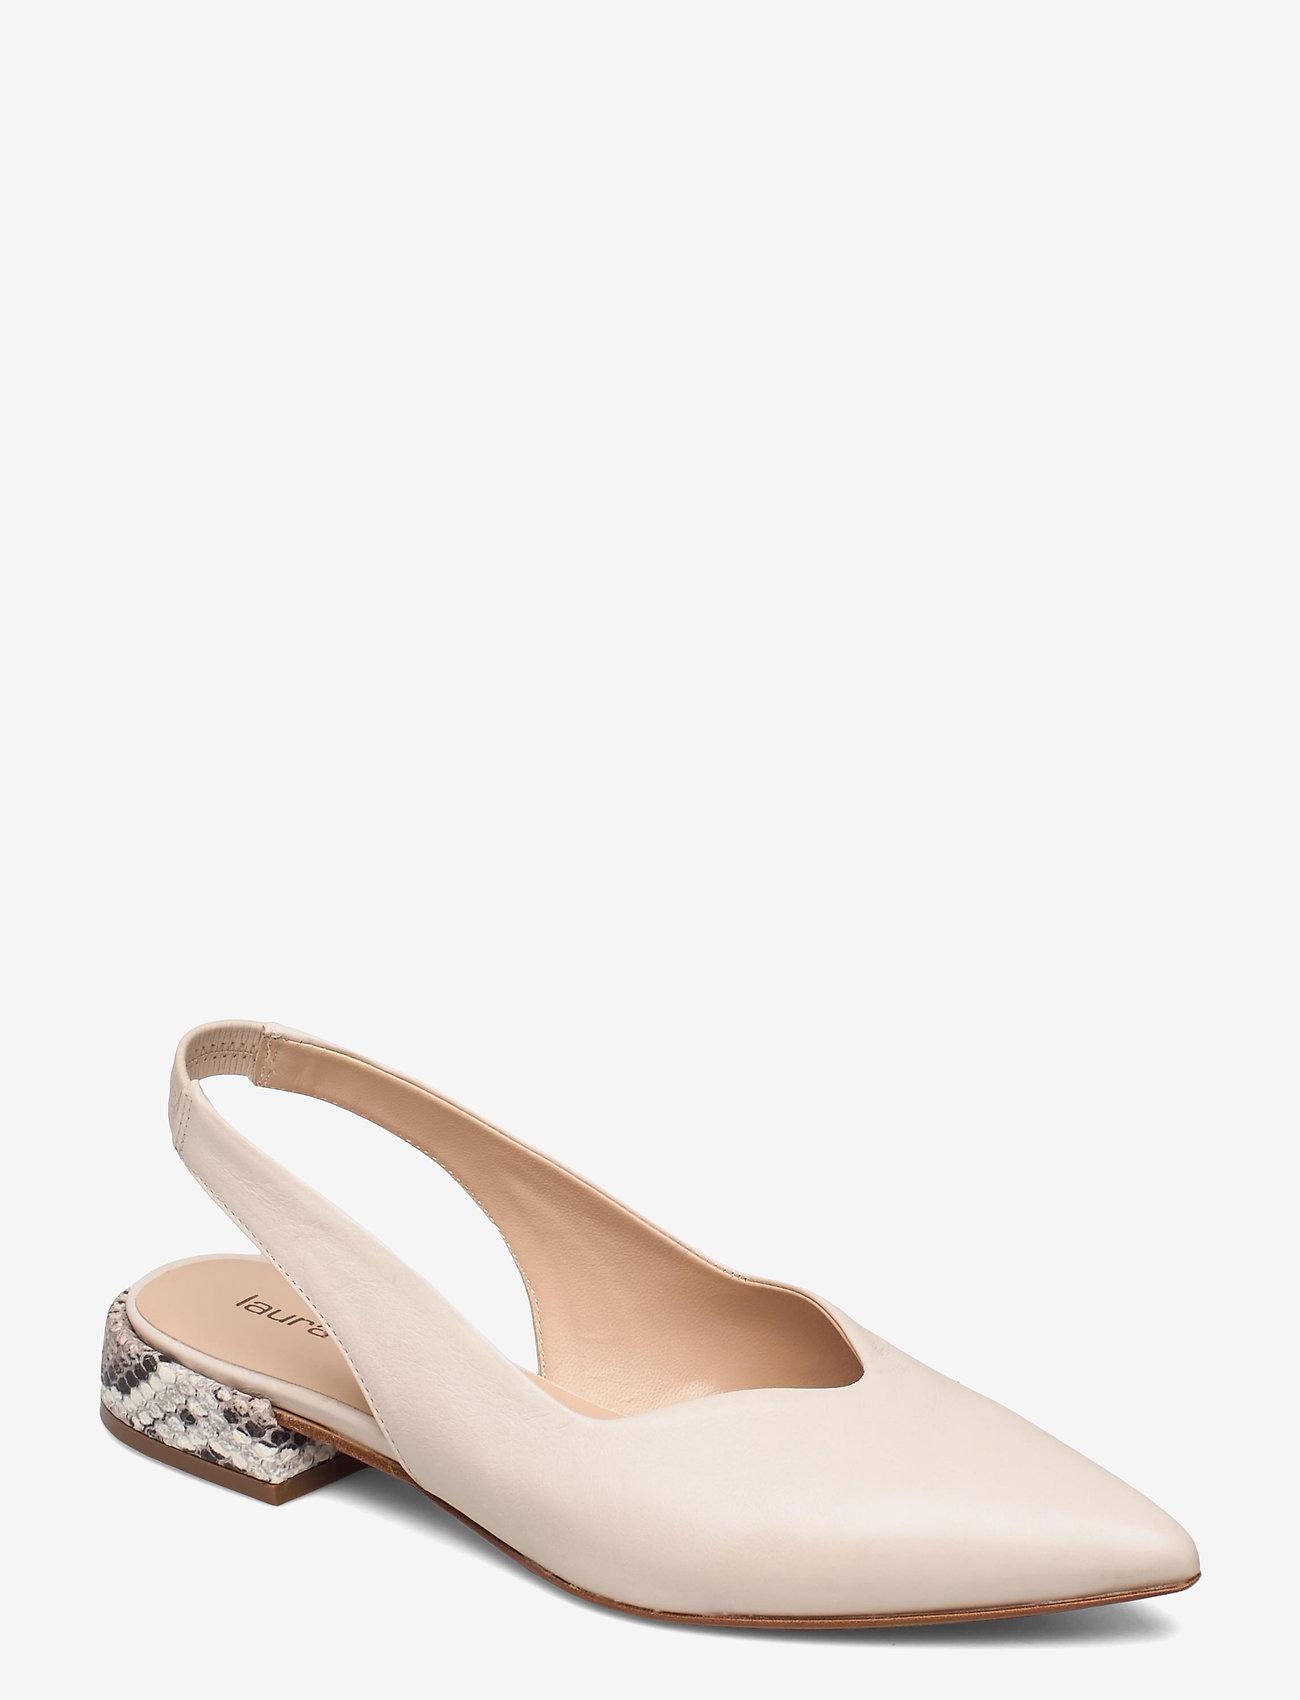 Laura Bellariva - Flats - ballerinas - ecru/beige - 0